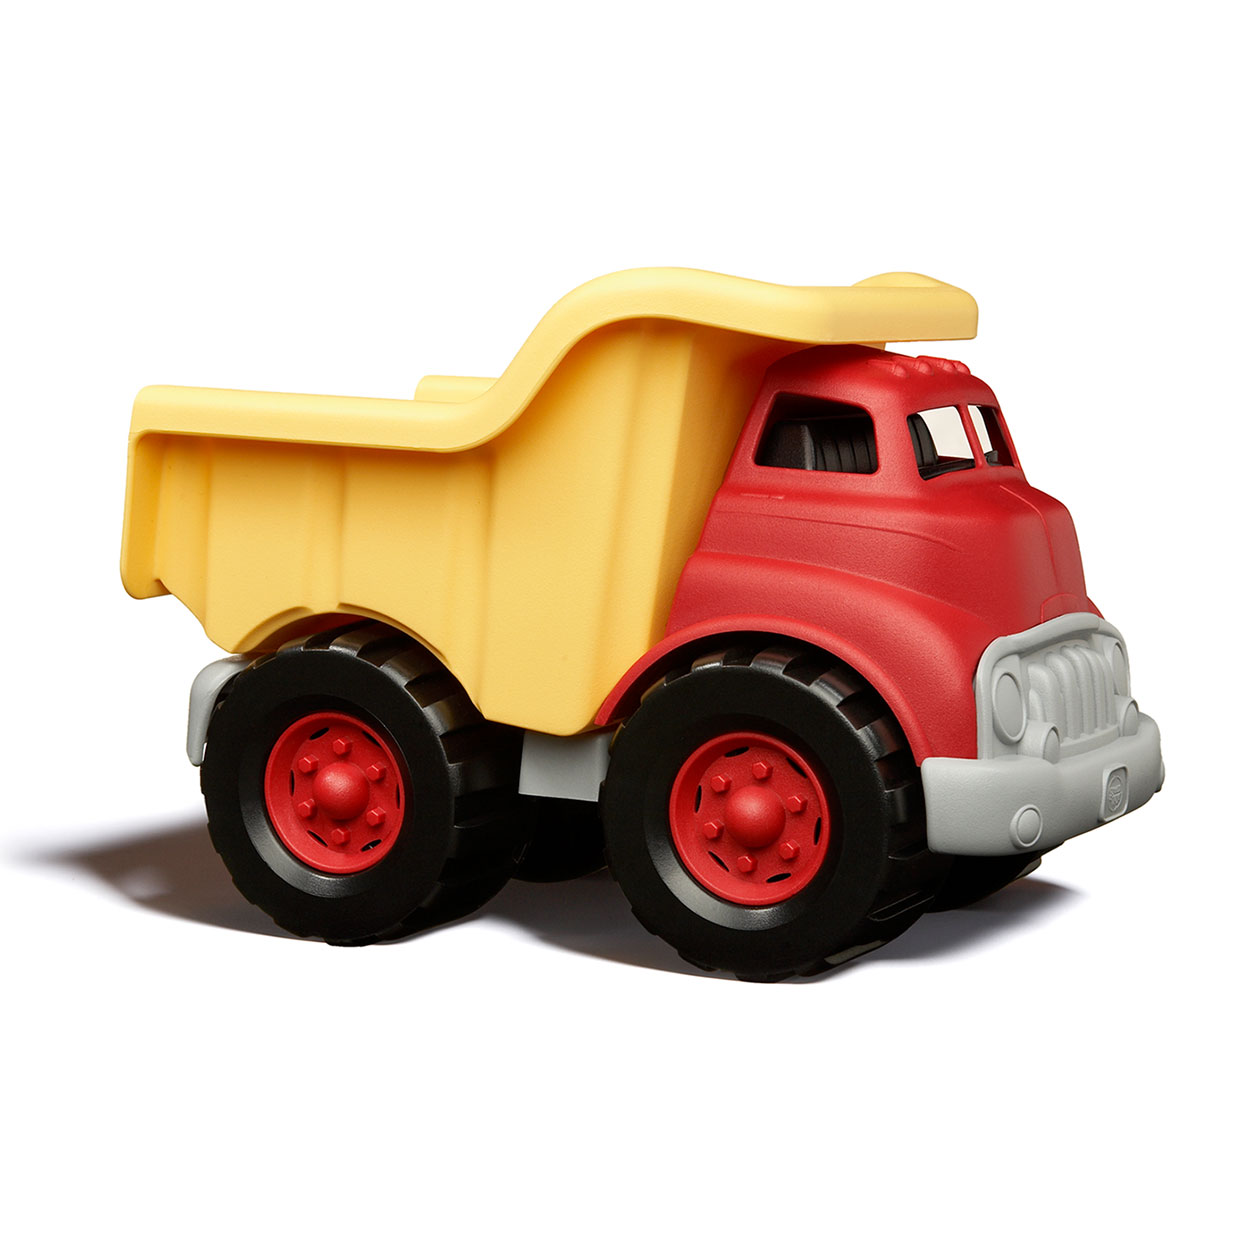 Toys Pink Dump Truck : Green toys kiepauto online kopen lobbes